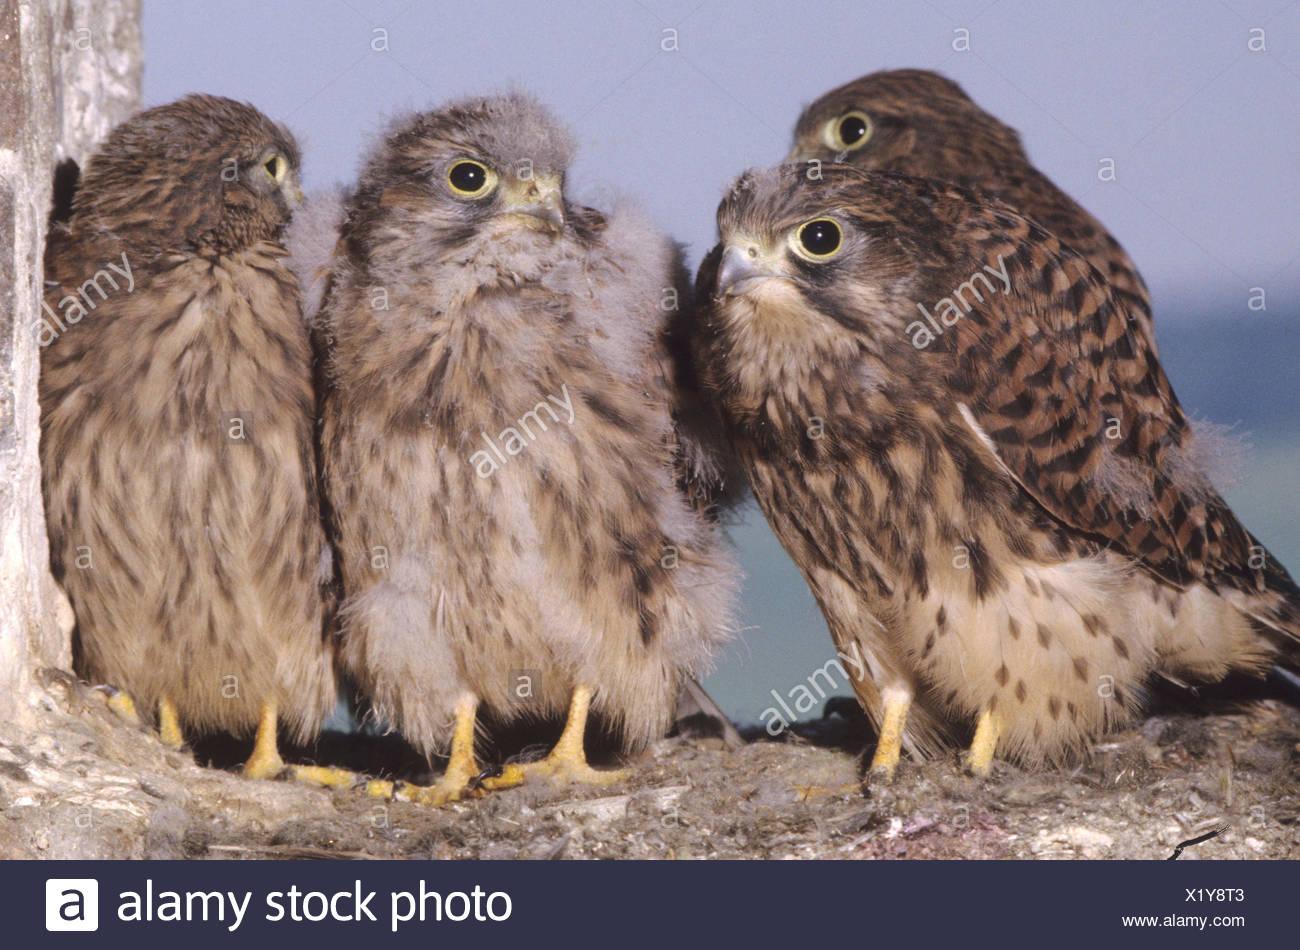 Kestrels (Falco tinnunculus), nearly fledged young falcons, Allgaeu, Bavaria, Germany - Stock Image